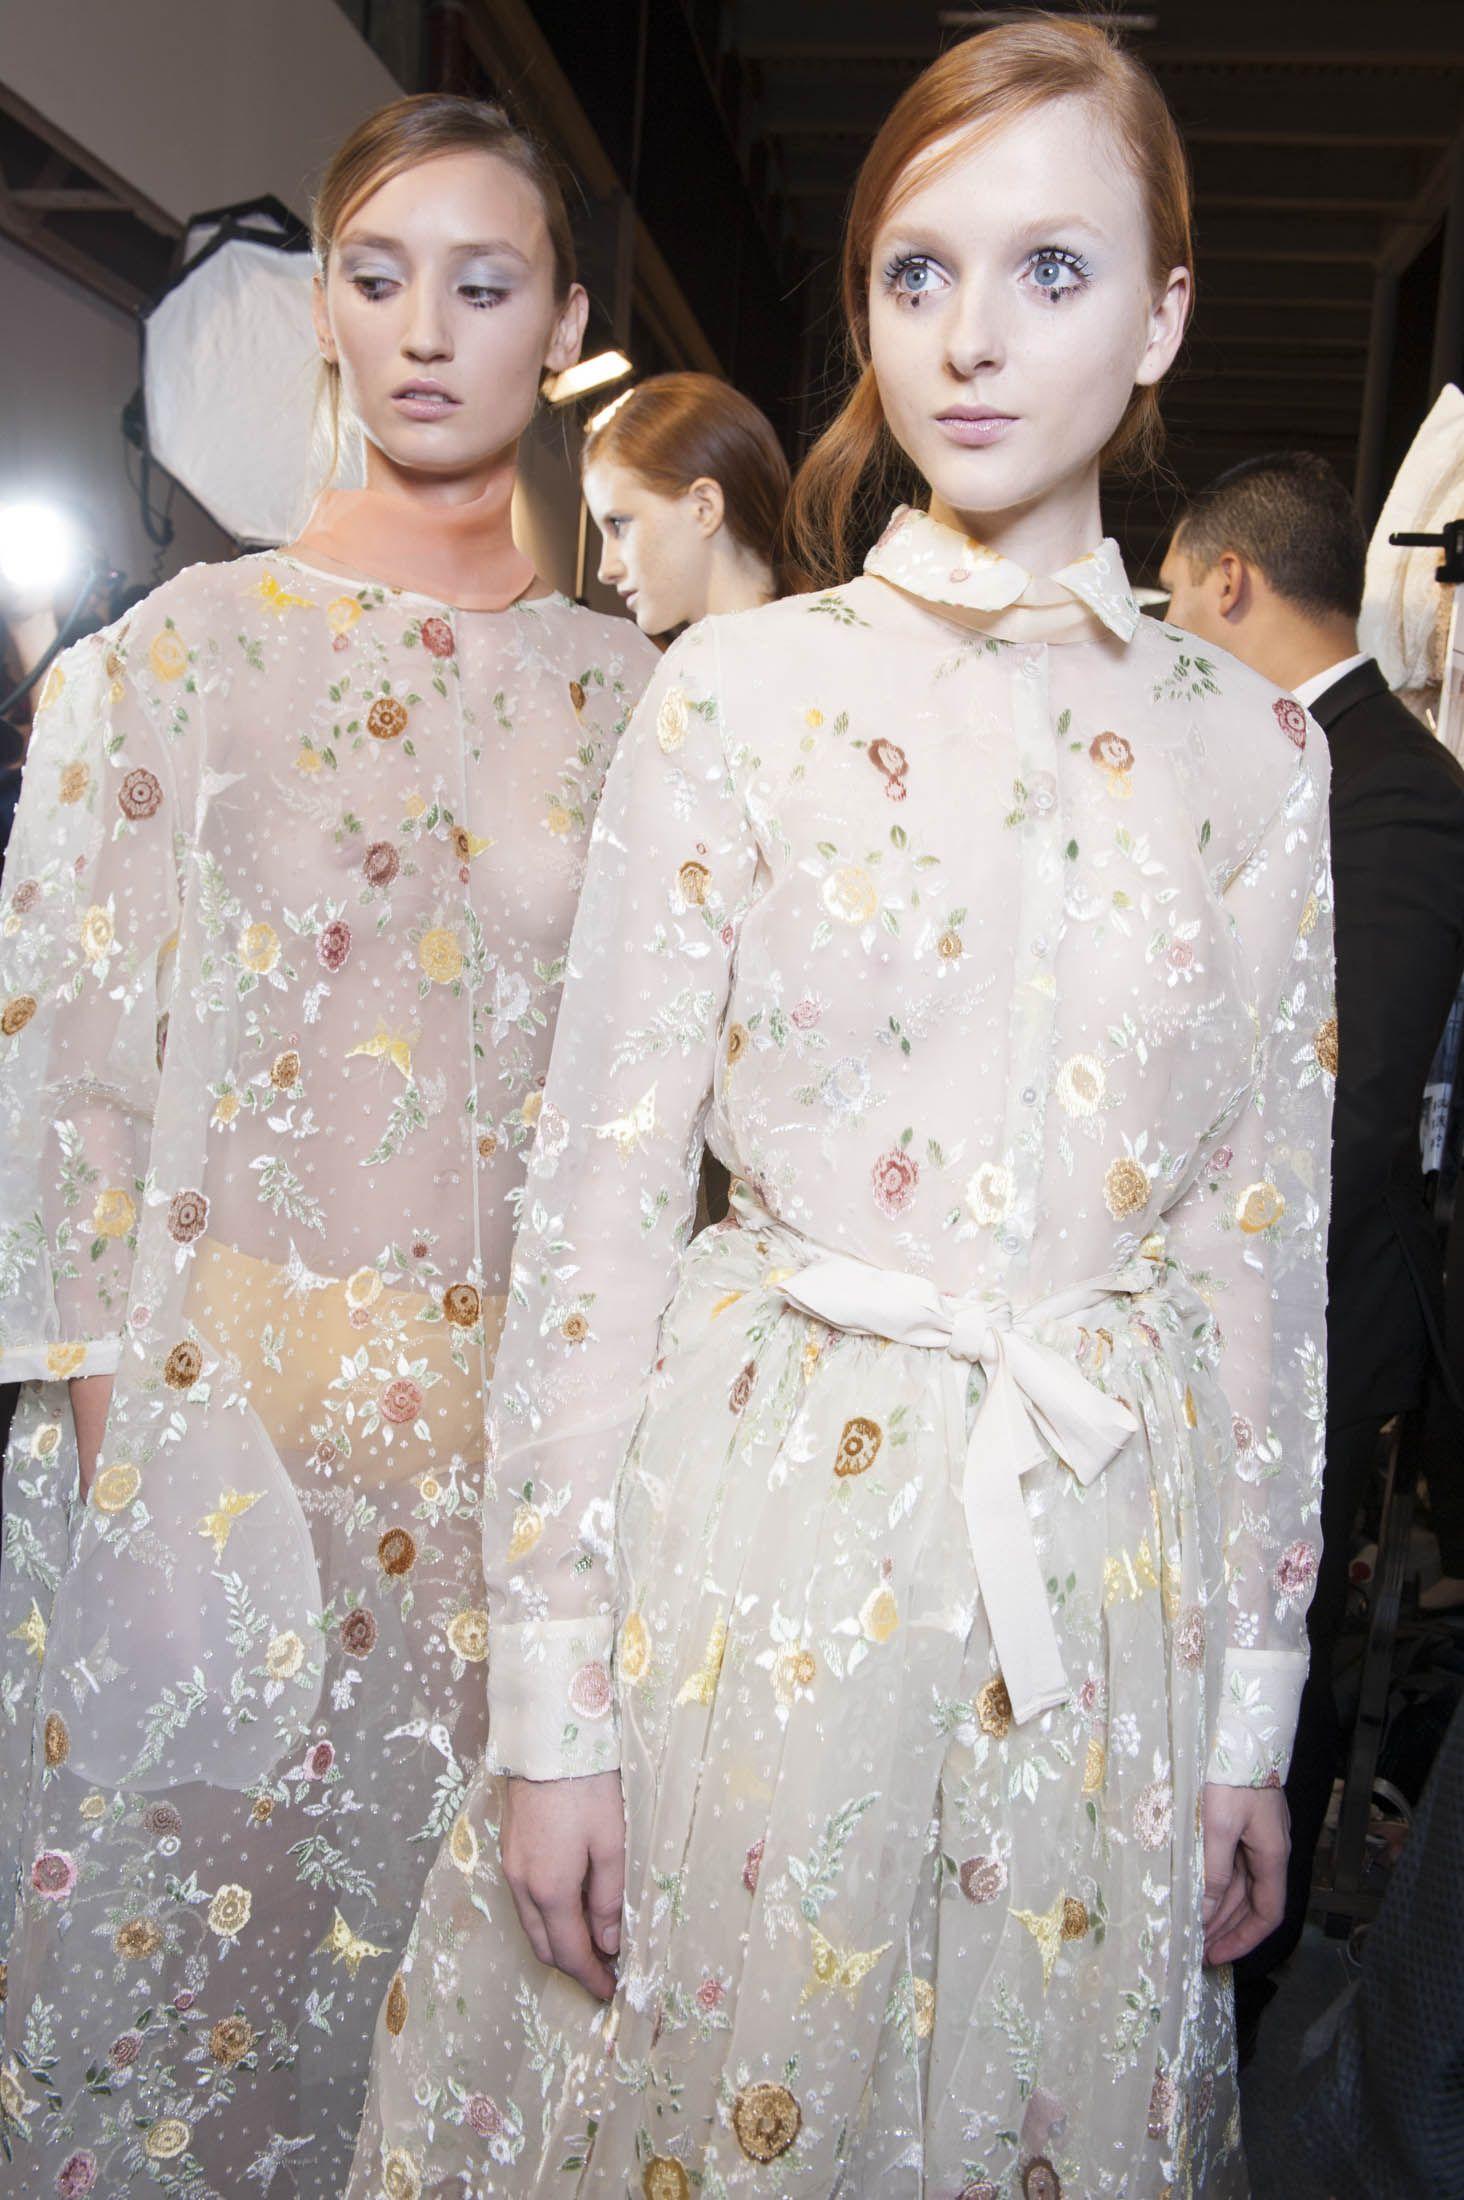 Backstage Pass: Paris Fashion Week Spring 2015 - Backstage at Rochas Spring 2015